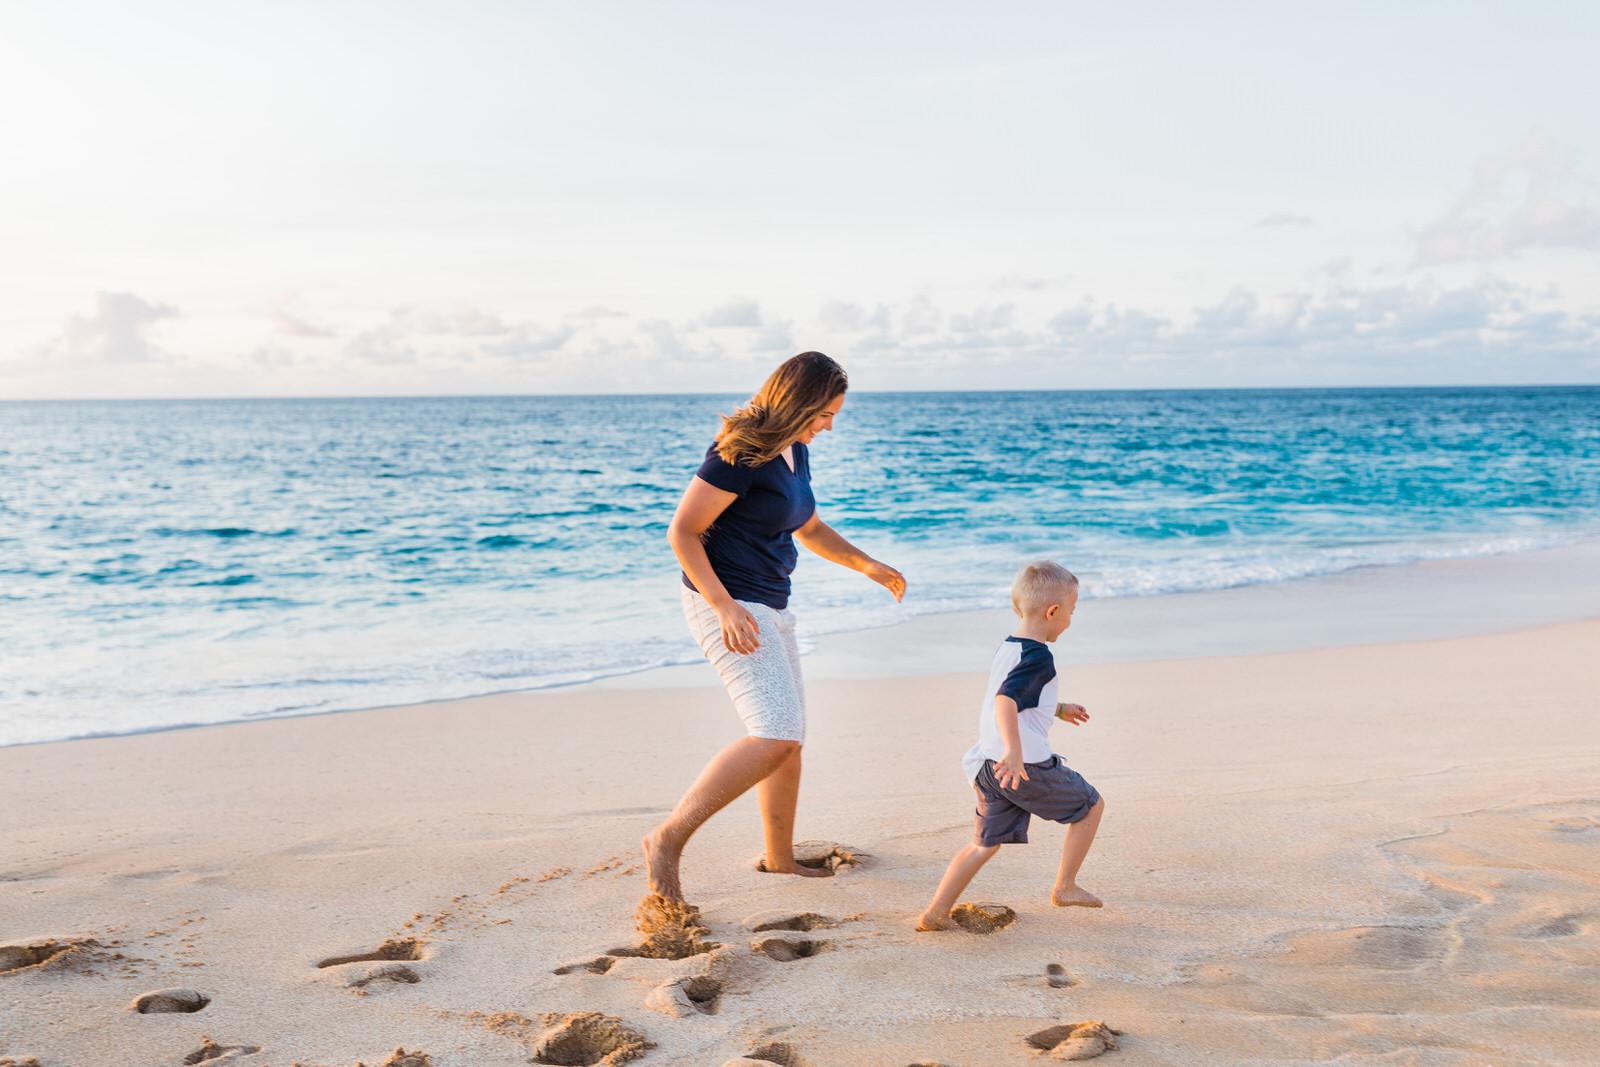 extended-family-big-island-vacation-cousins-grandparents-beach-waikoloa-sunset-hawaii-7219.jpg